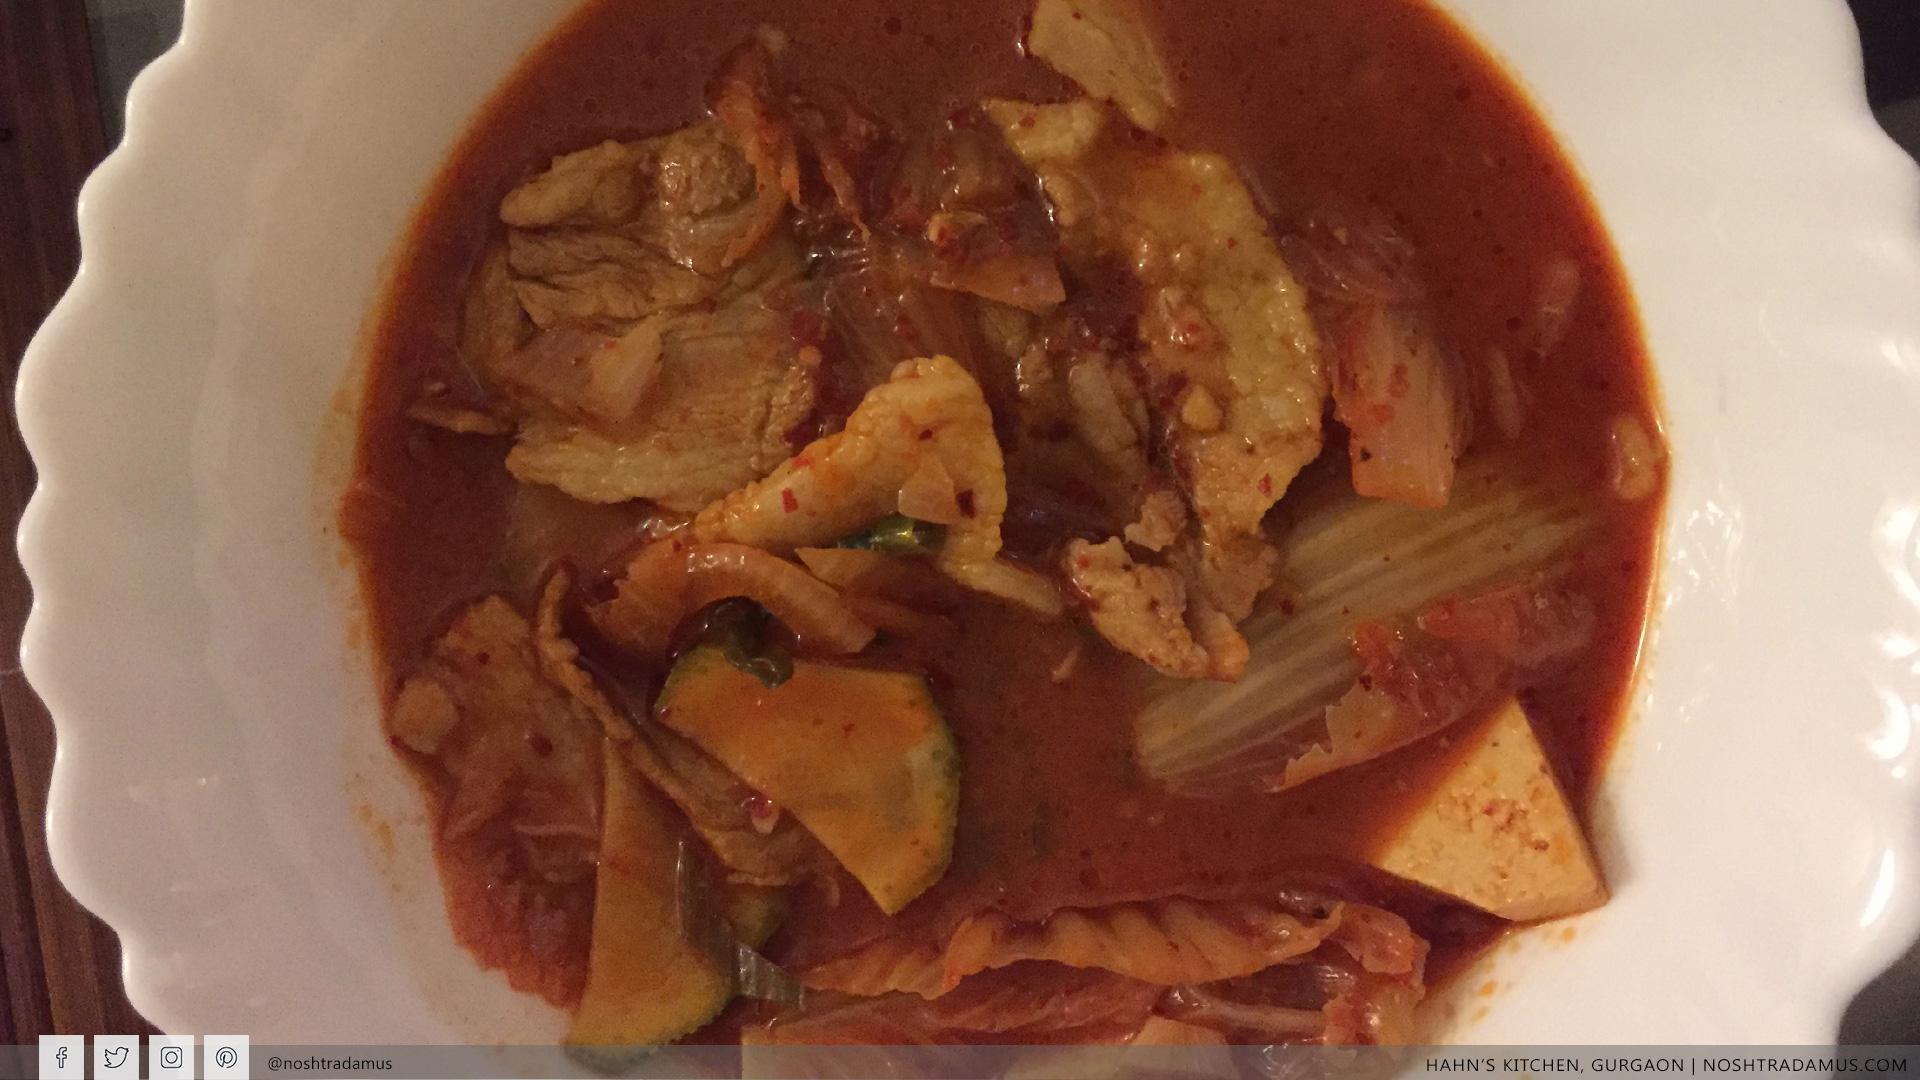 Mystery Dish 2 at Hahn's Kitchen, Gurgaon